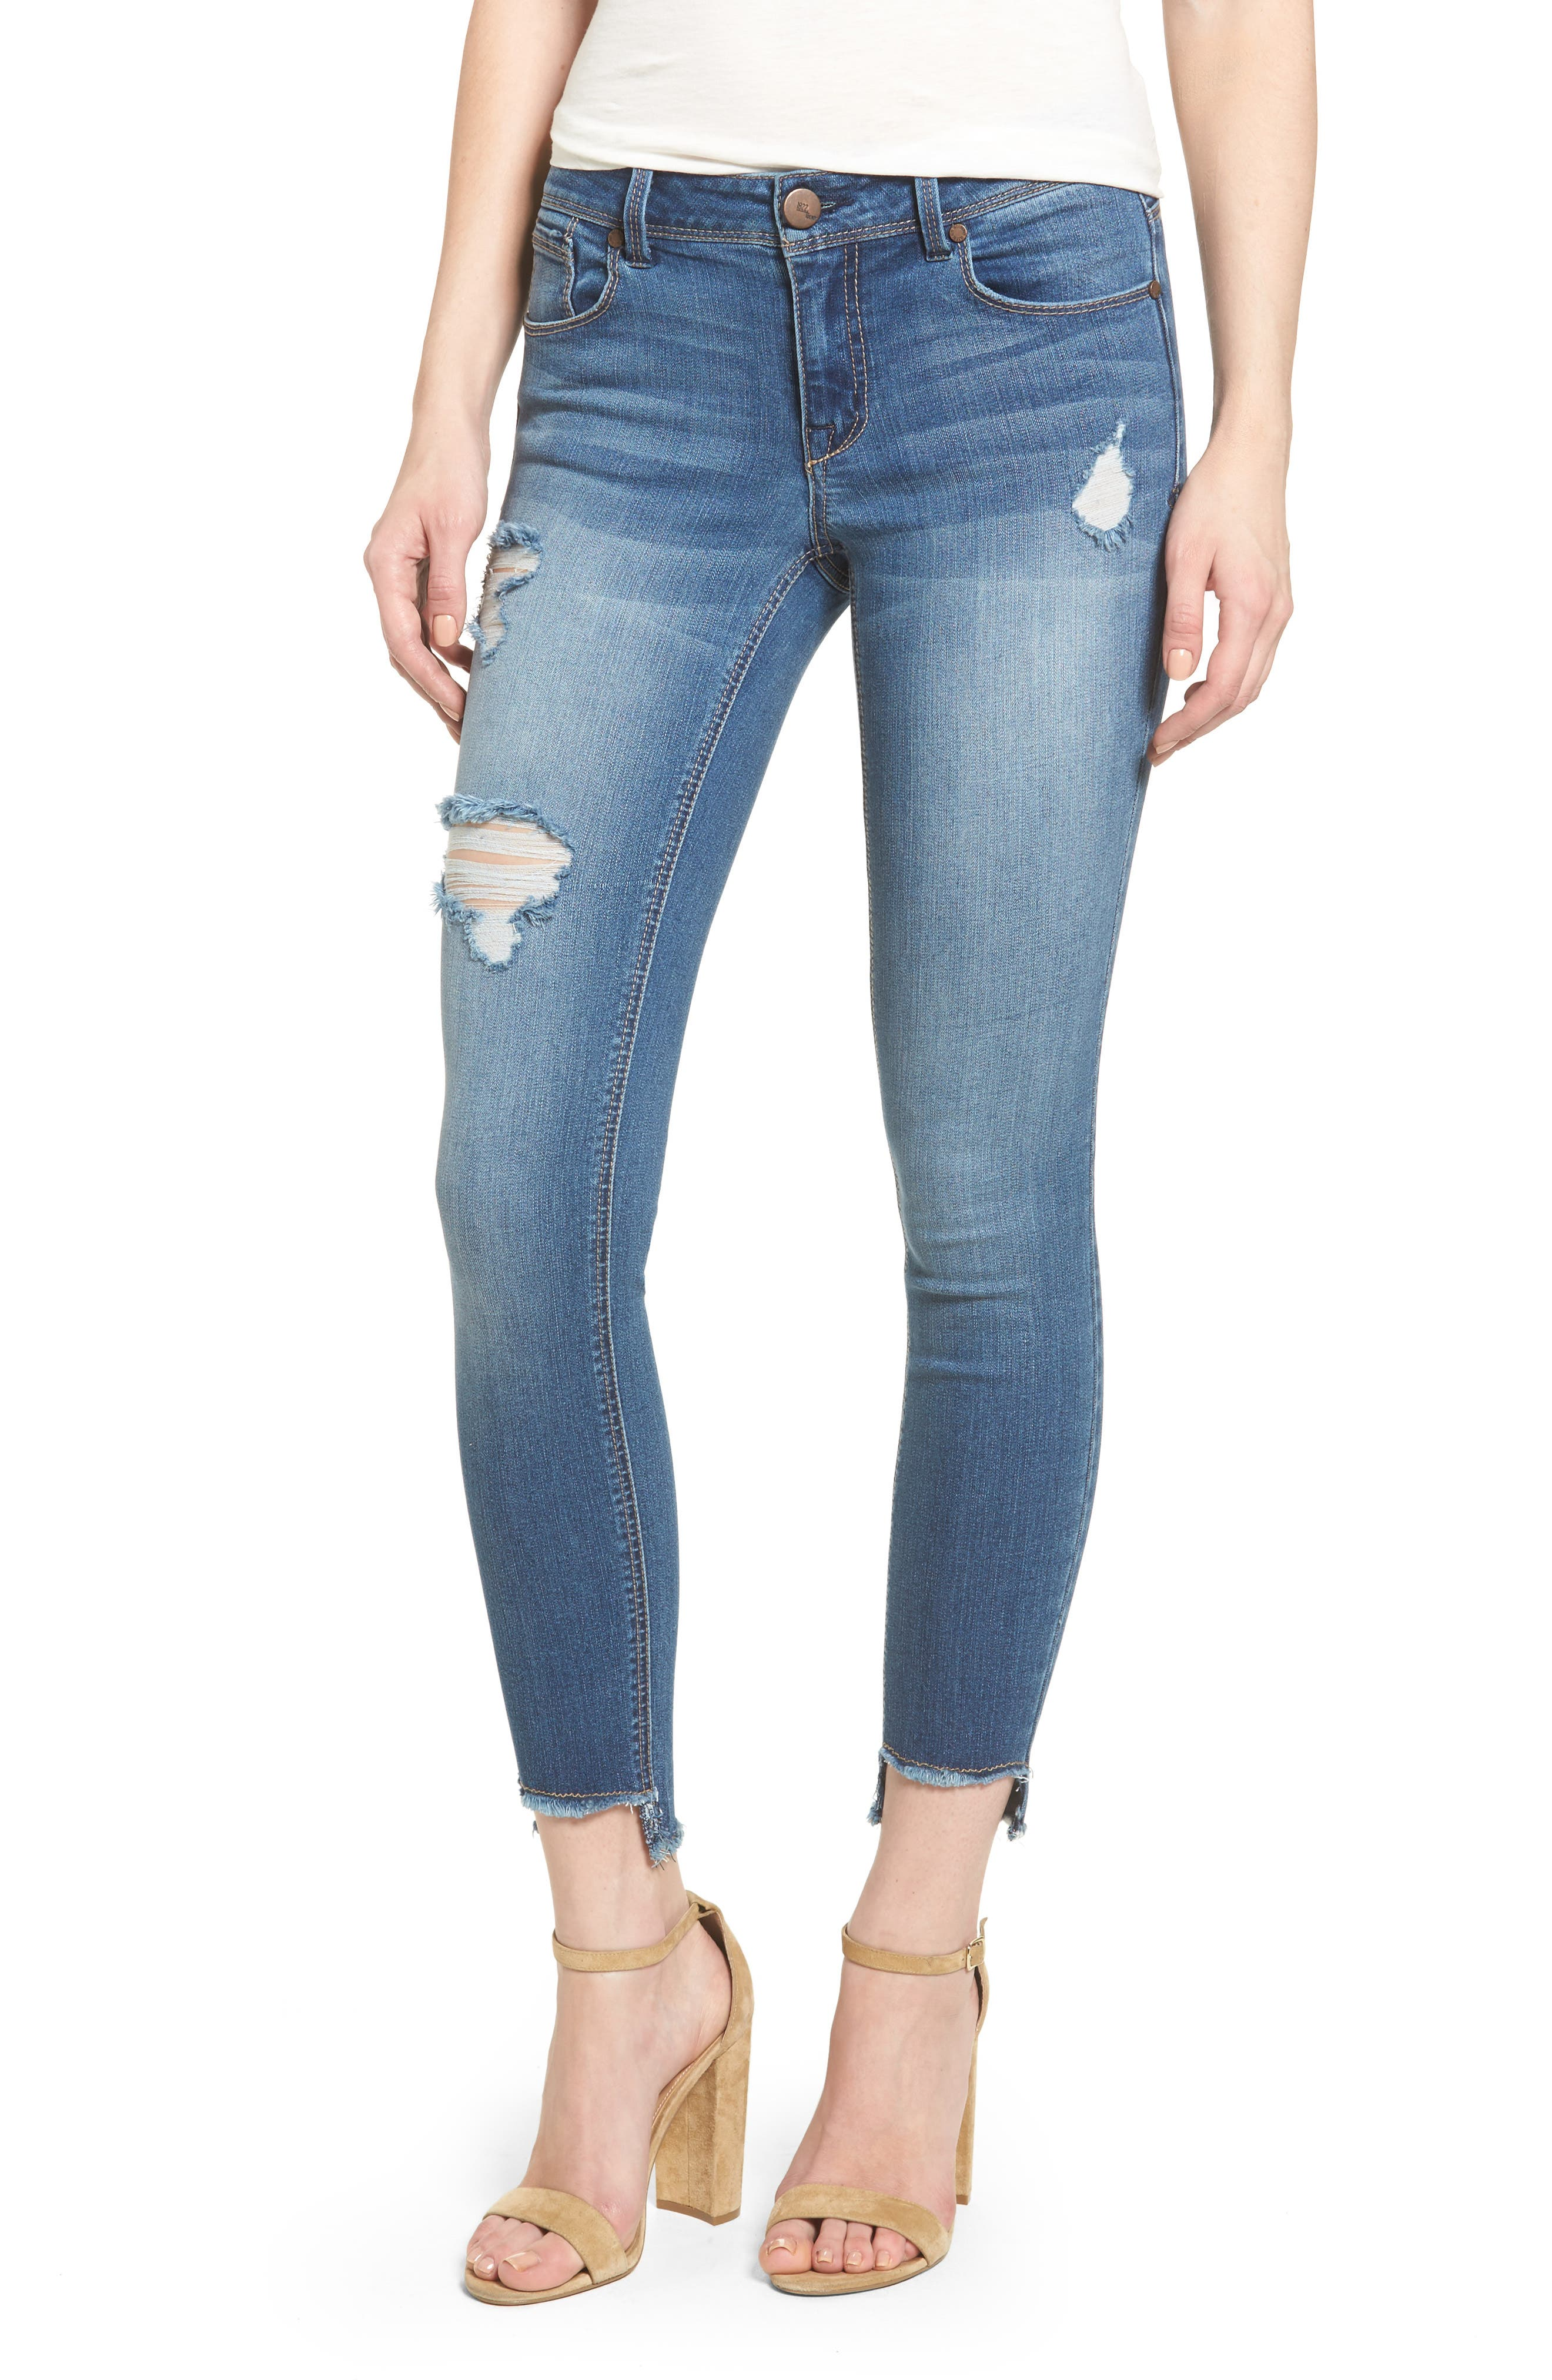 Alternate Image 1 Selected - 1822 Denim Step Hem Skinny Jeans (Greg)